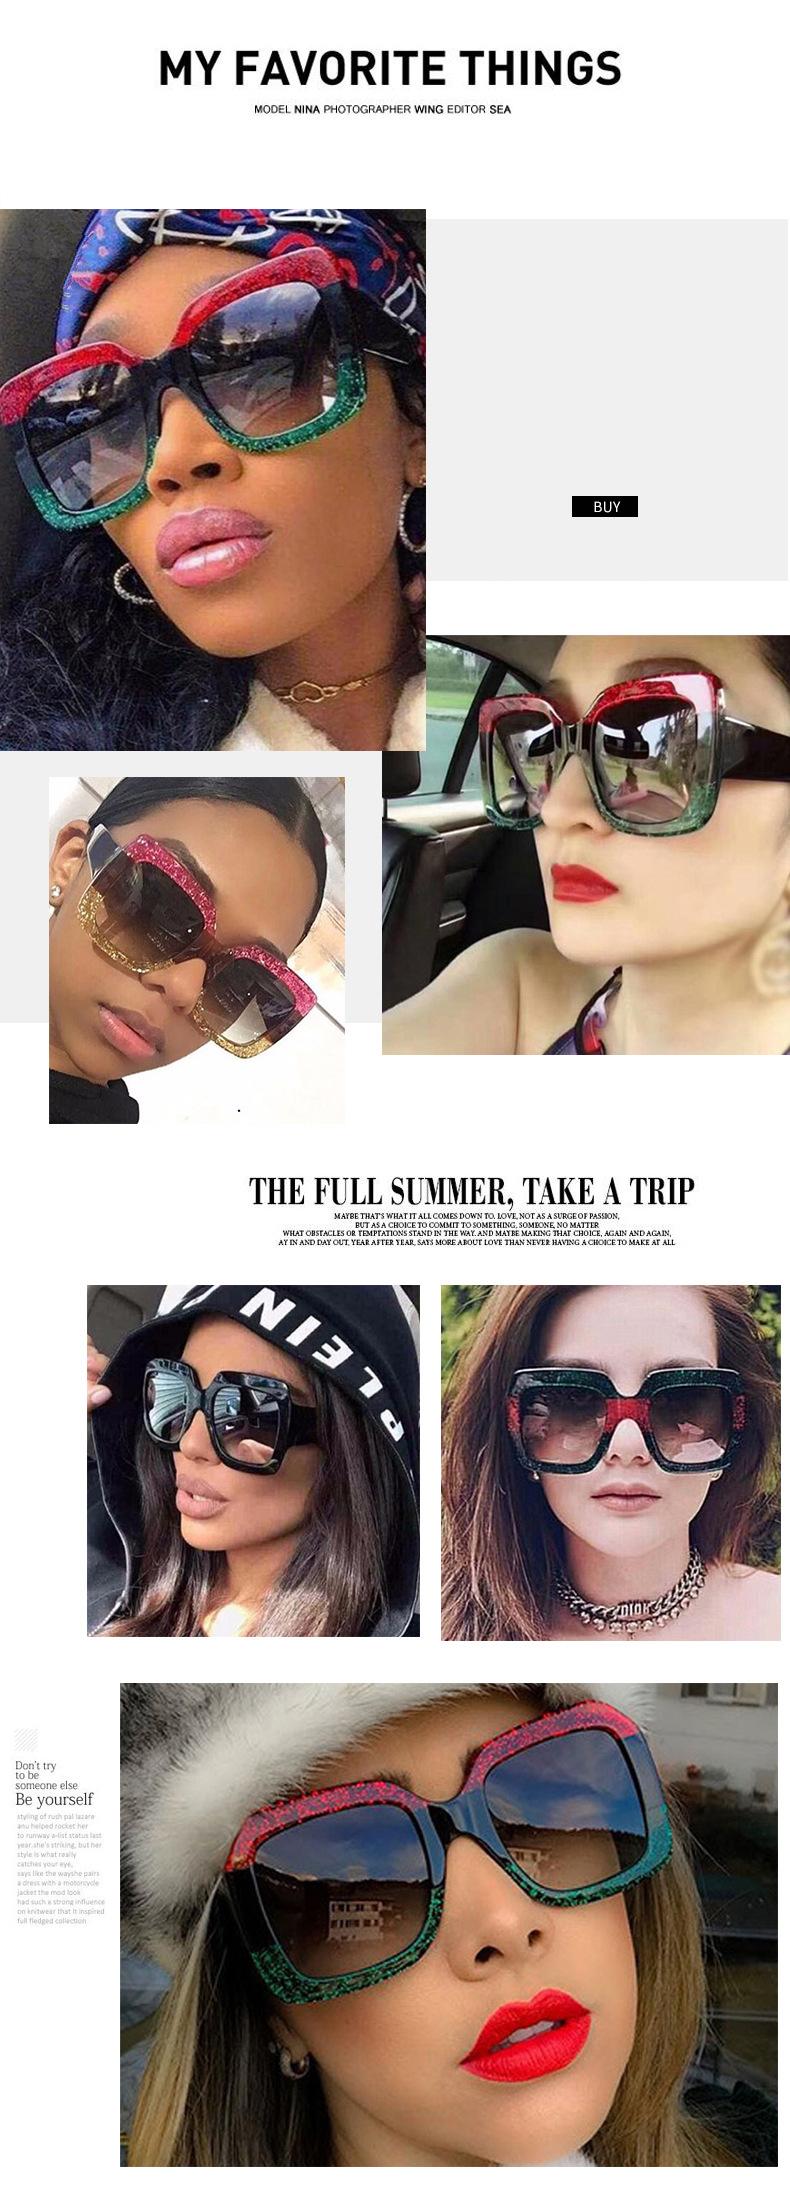 19 Oversized Sunglasses for Women Brand Designer Retro Sun glasses Red Green Shades Eyewear sunglasses woman 1